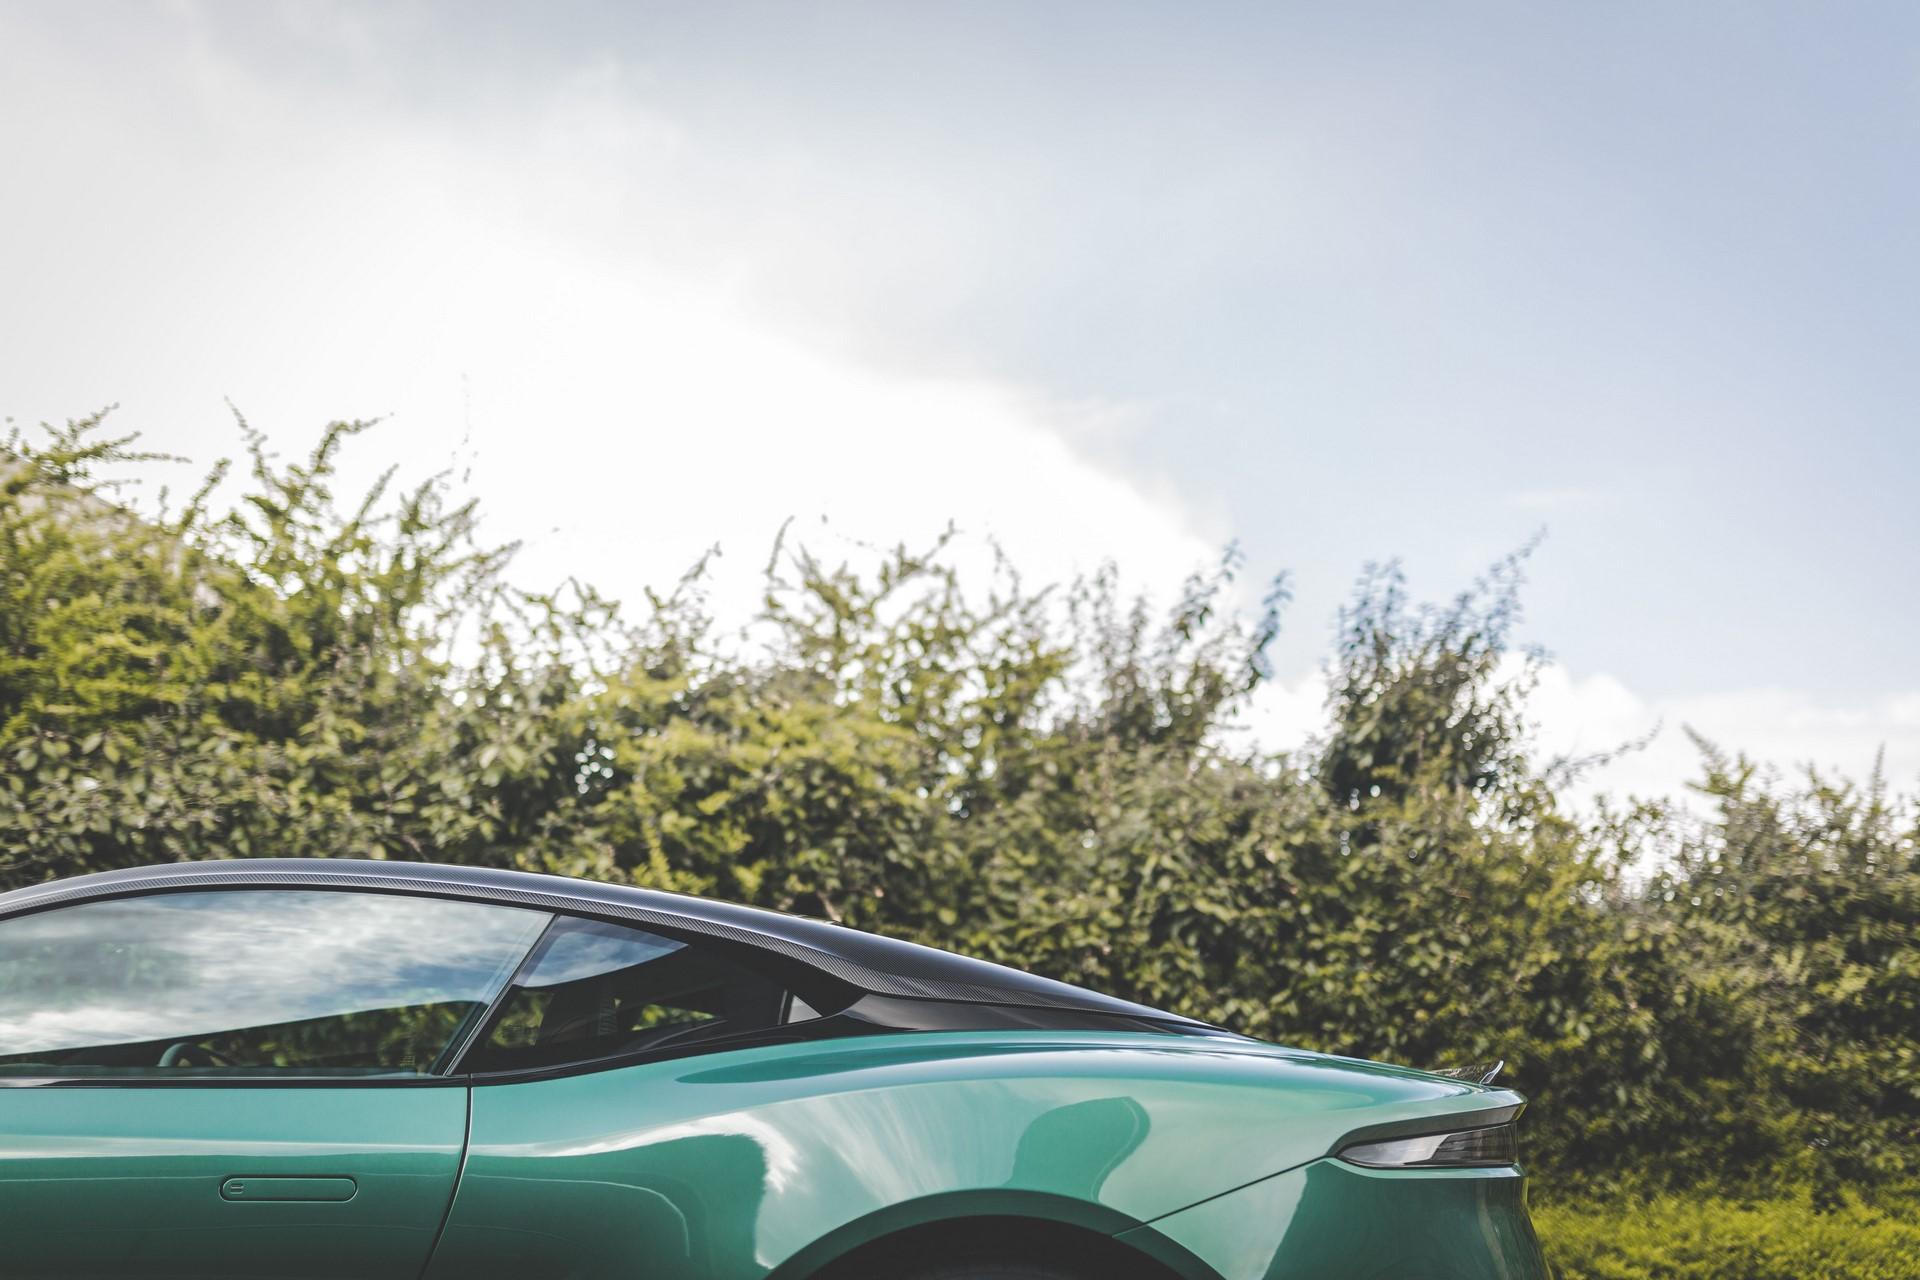 Aston-Martin-DBS-59-Edition-5